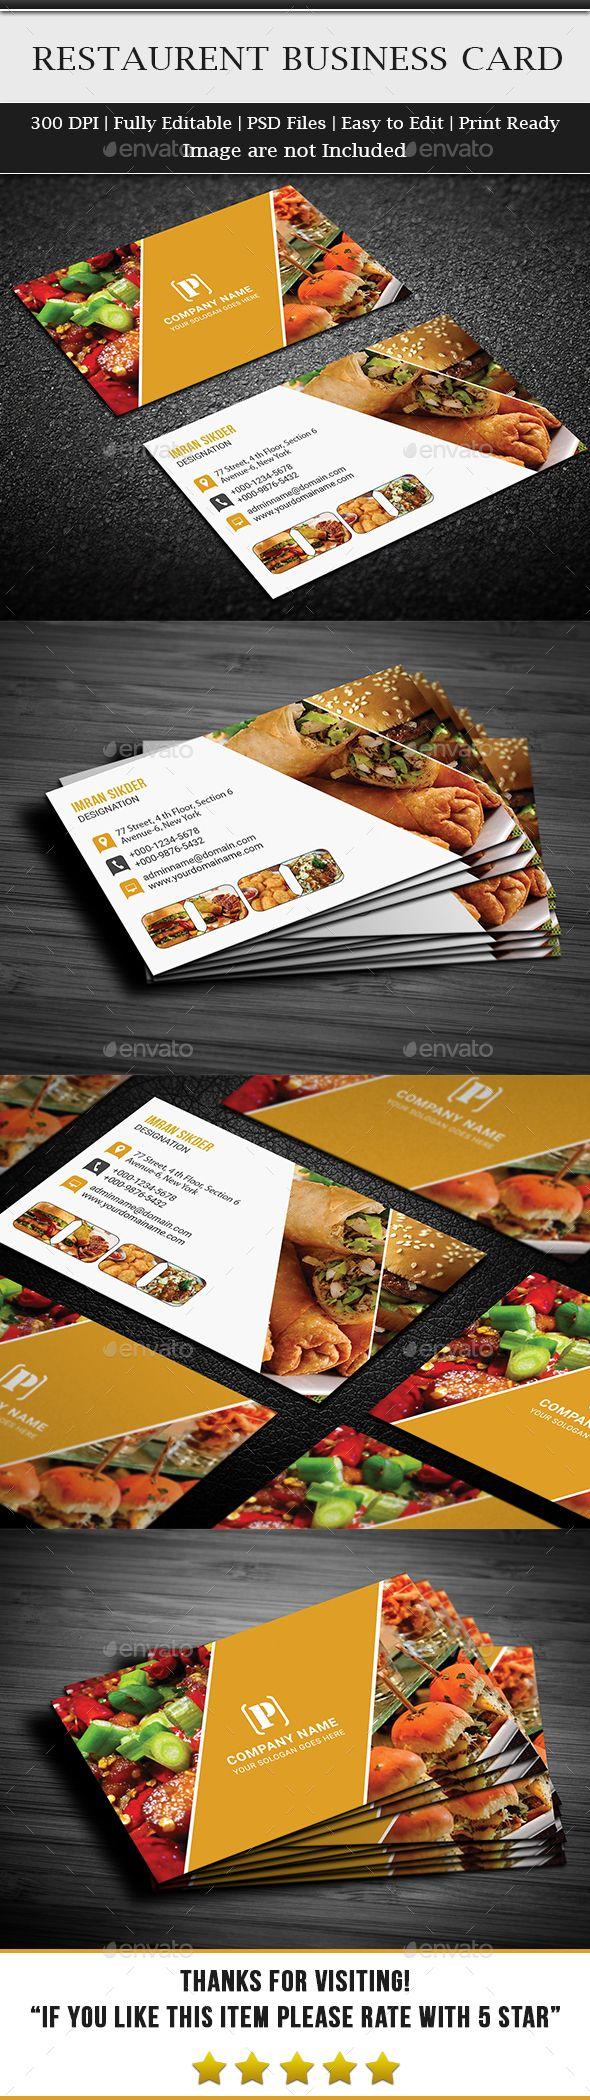 Restaurant Business Card Template PSD #design Download: http://graphicriver.net/item/restaurant-business-card/13365593?ref=ksioks